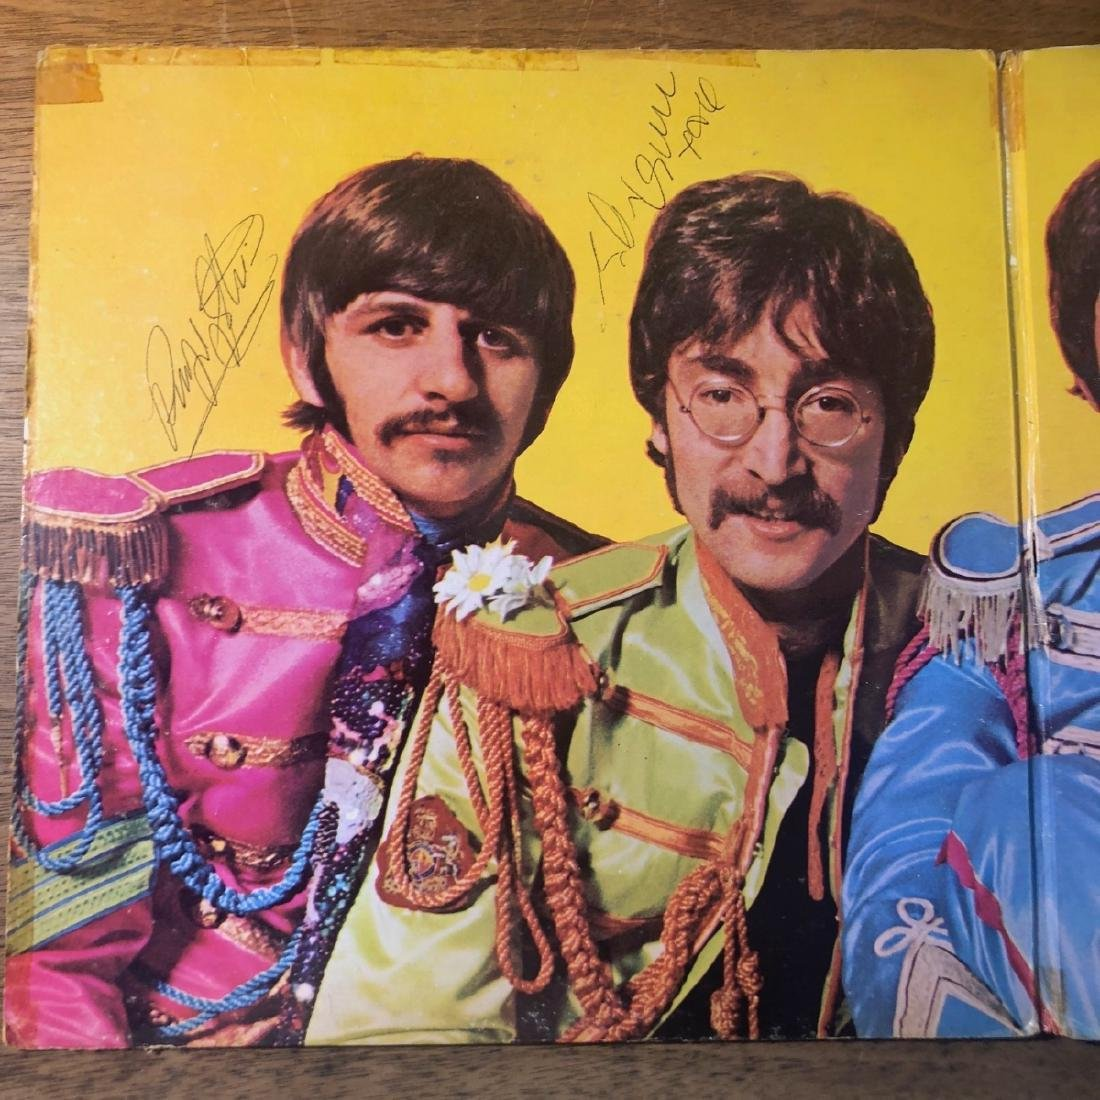 Signed Beatles Sgt Pepper Album